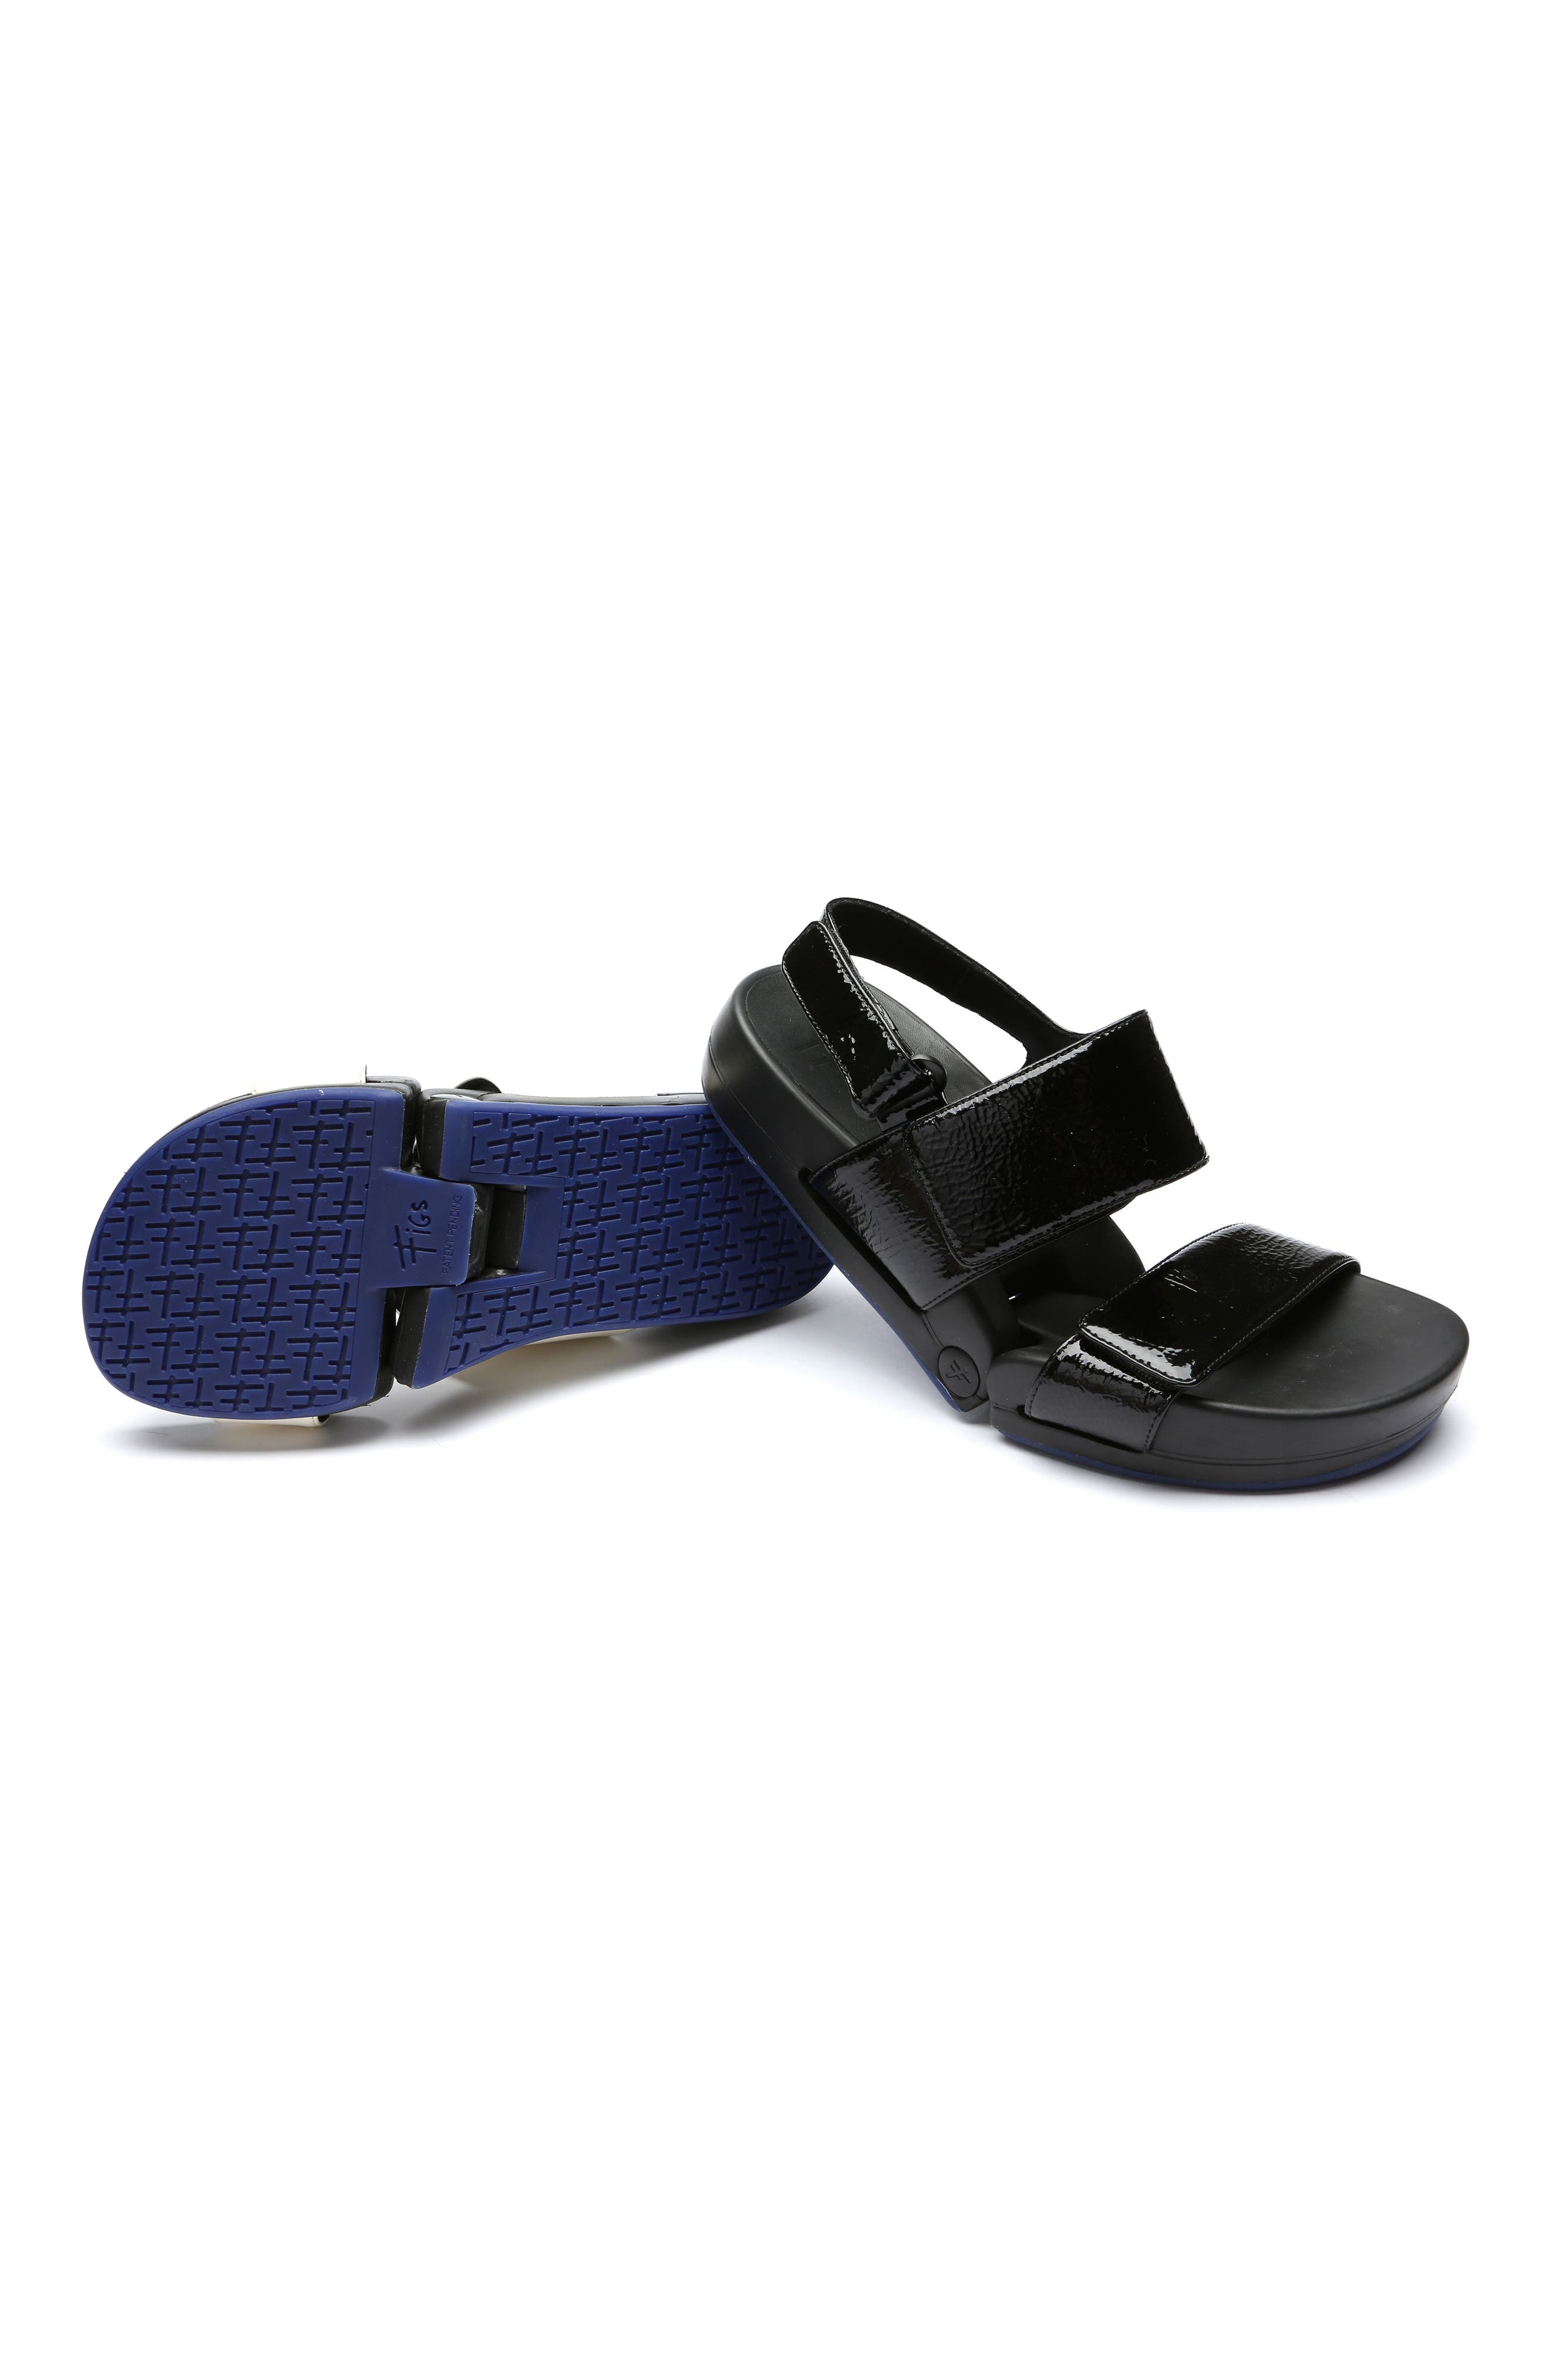 Figulous Sandal,                             Alternate thumbnail 7, color,                             BLACK CRINKLE PATENT LEATHER